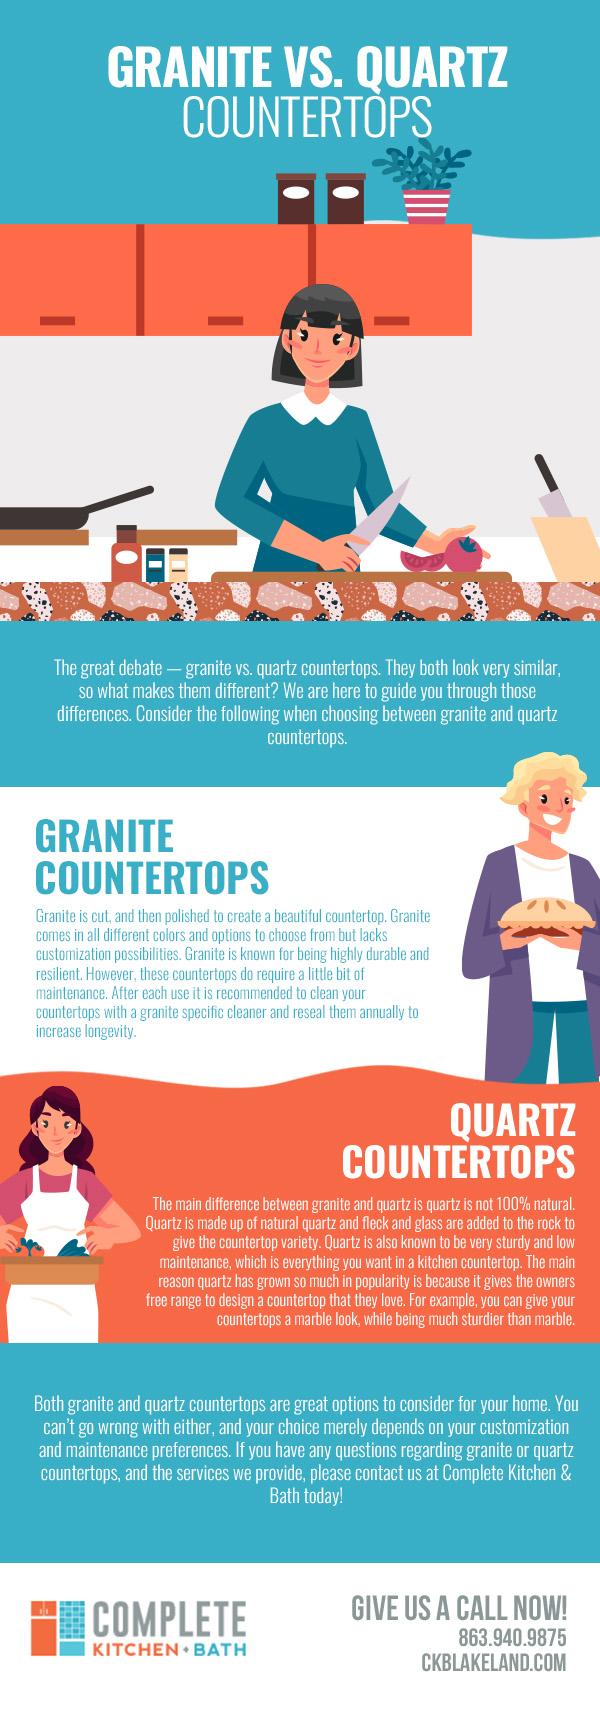 Granite vs. Quartz Countertops [infographic]